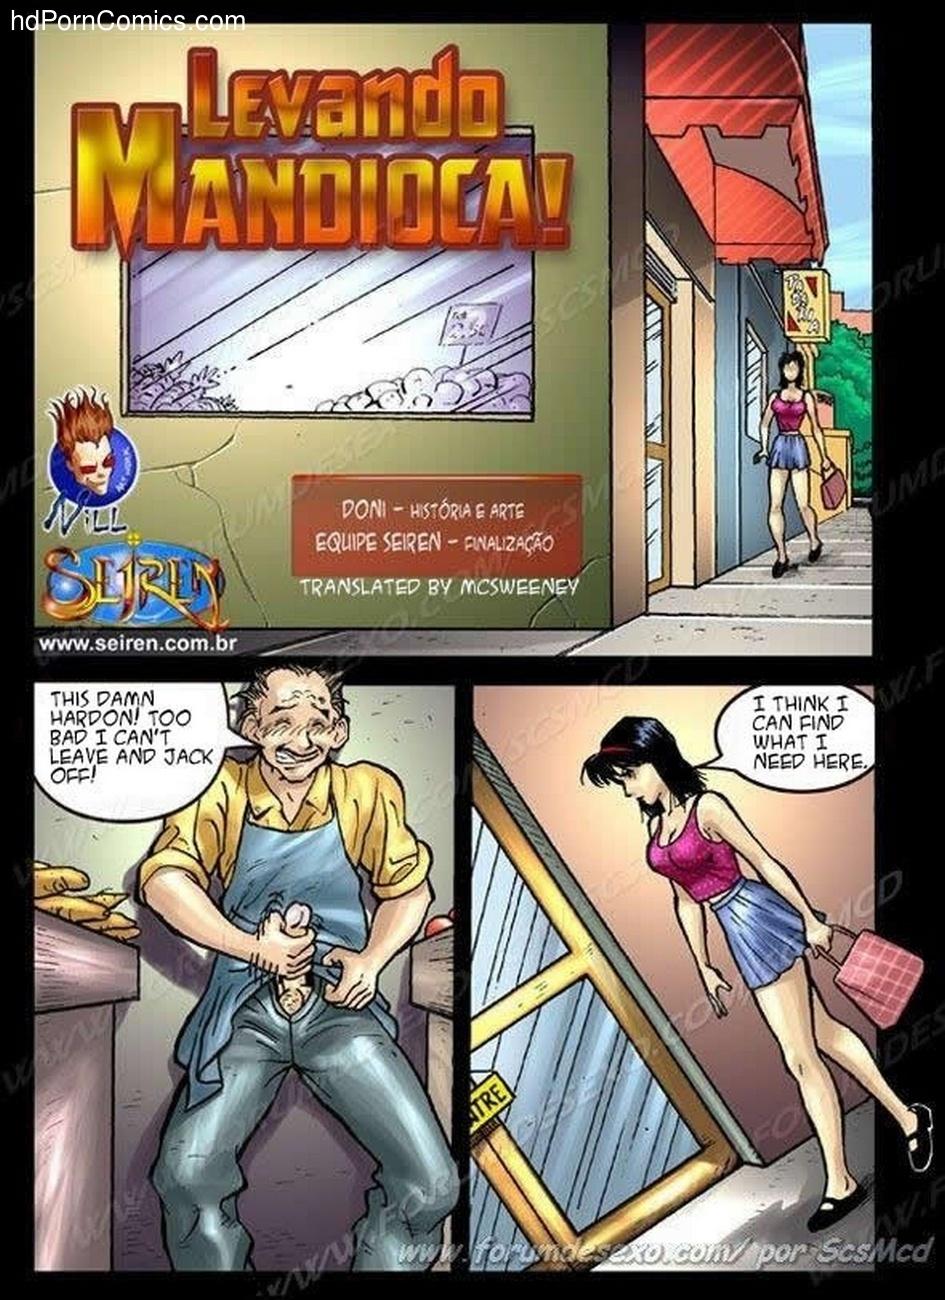 Levando Mandioca 2 free sex comic